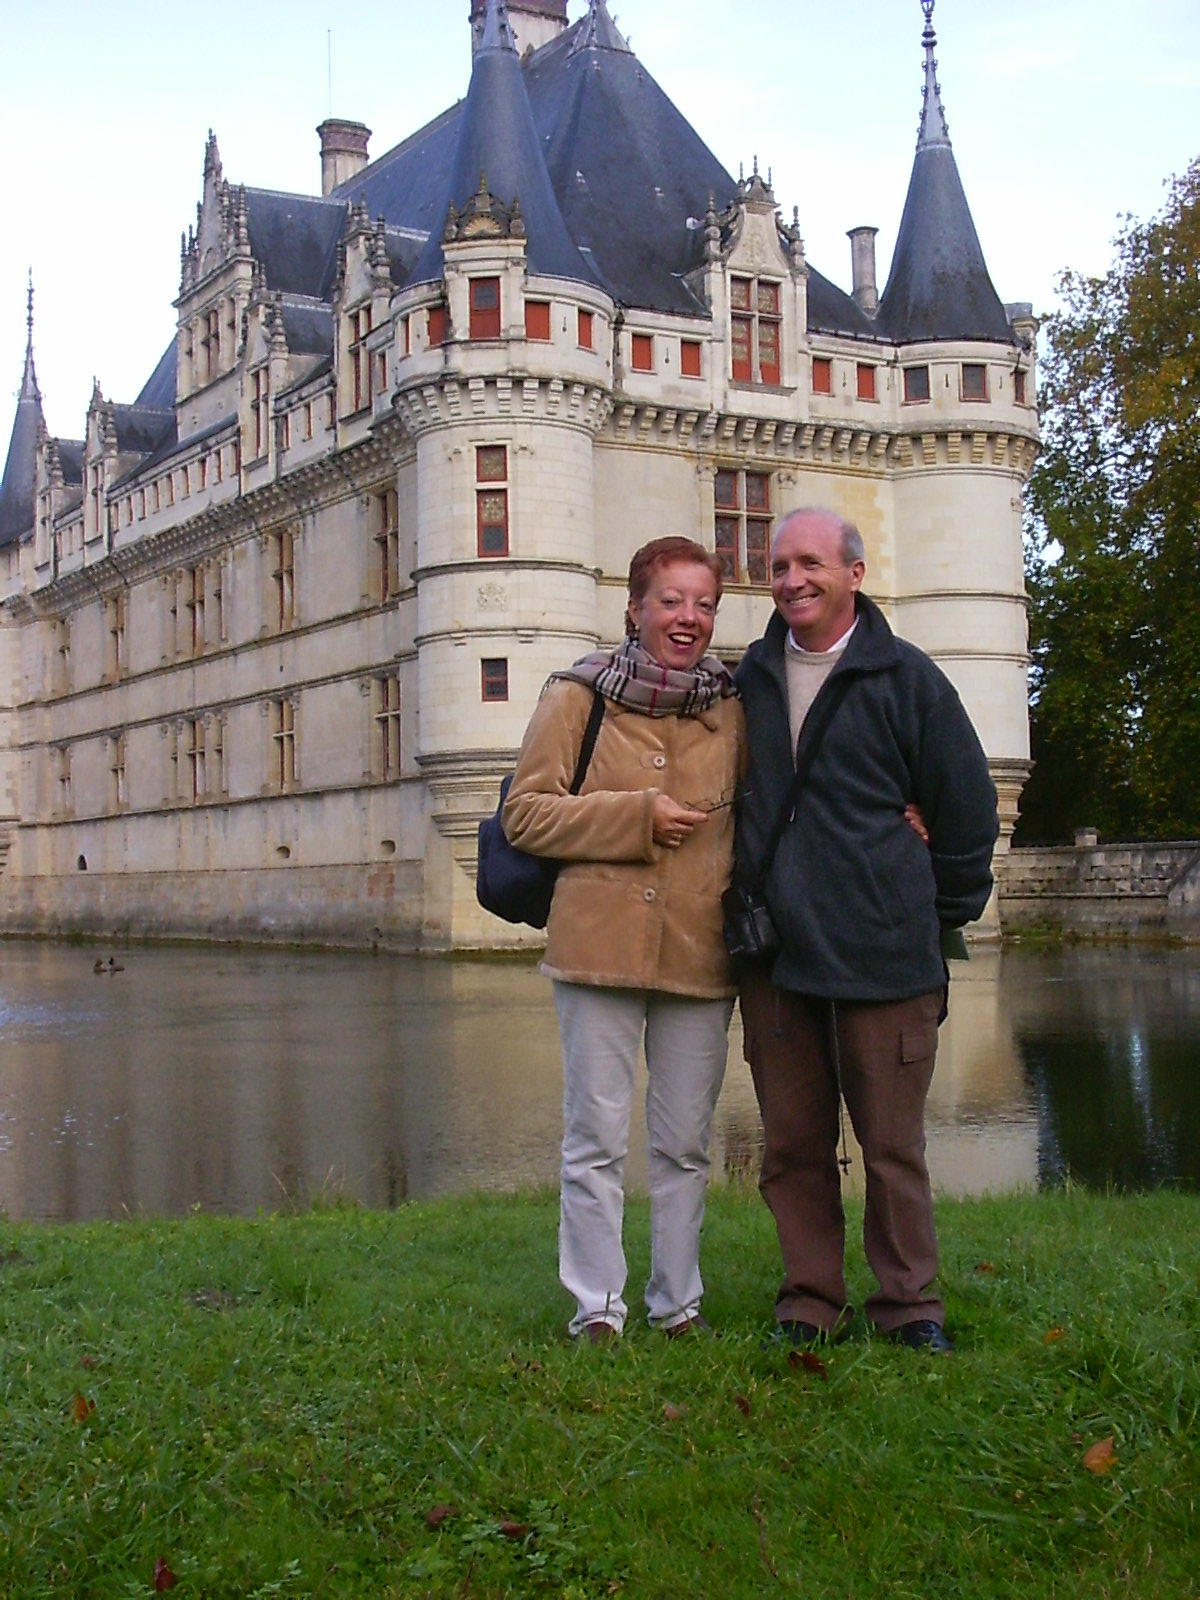 Francia los castillos del Loira